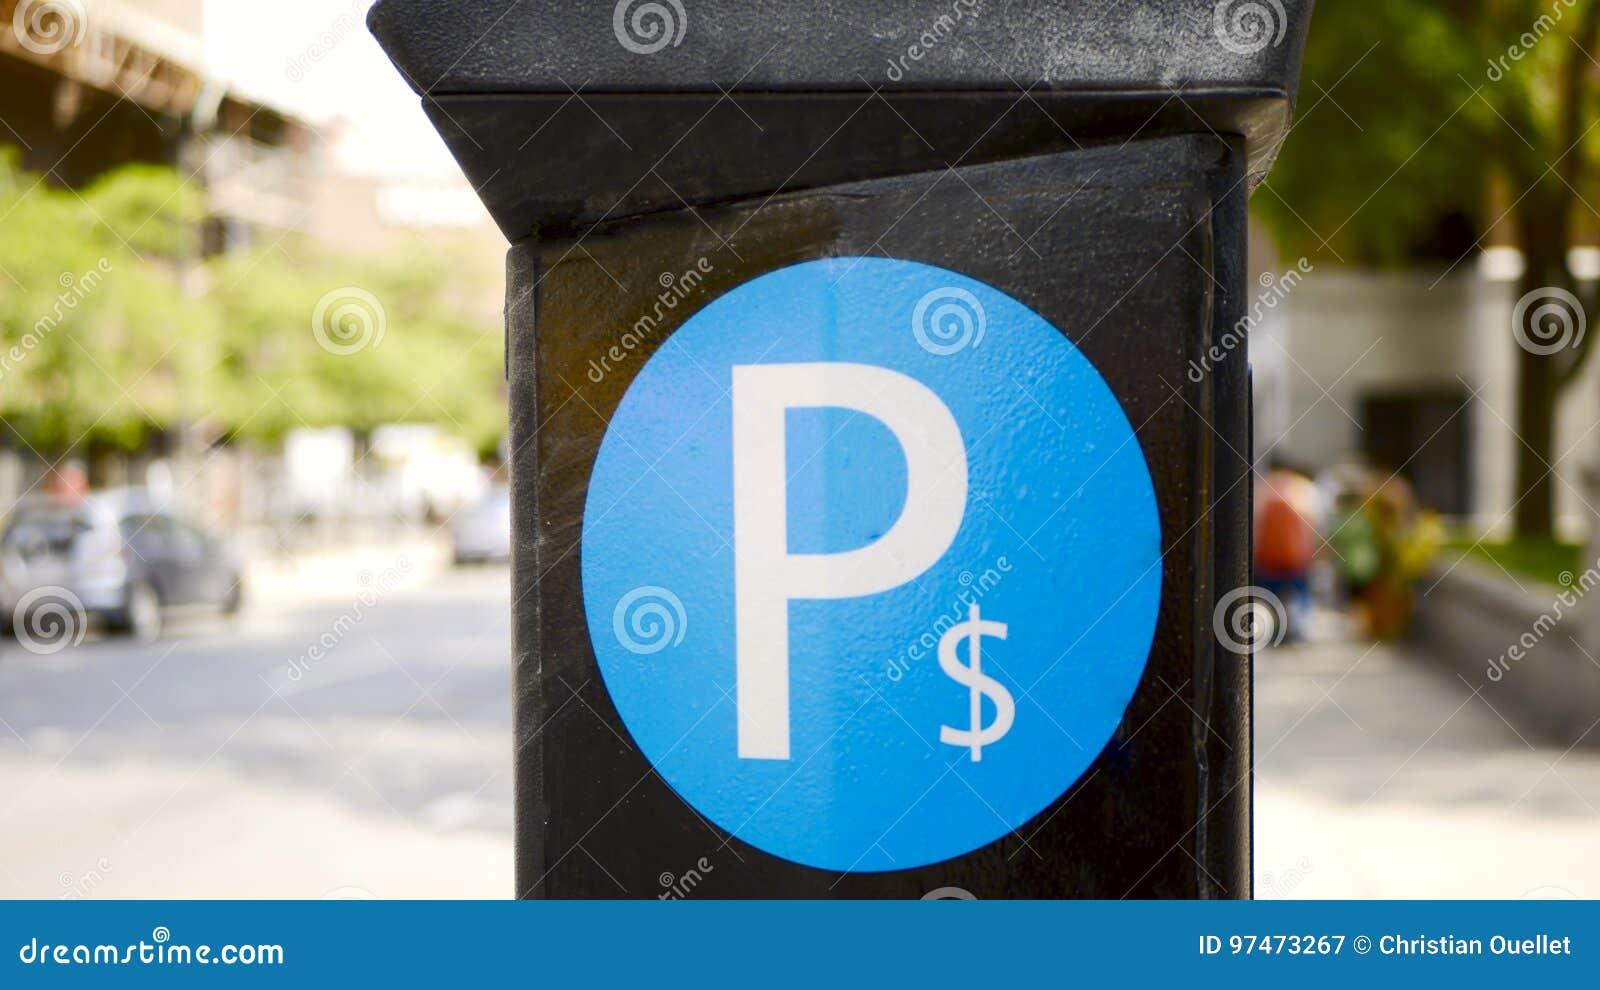 Municipal parking machine in Montreal, Canada